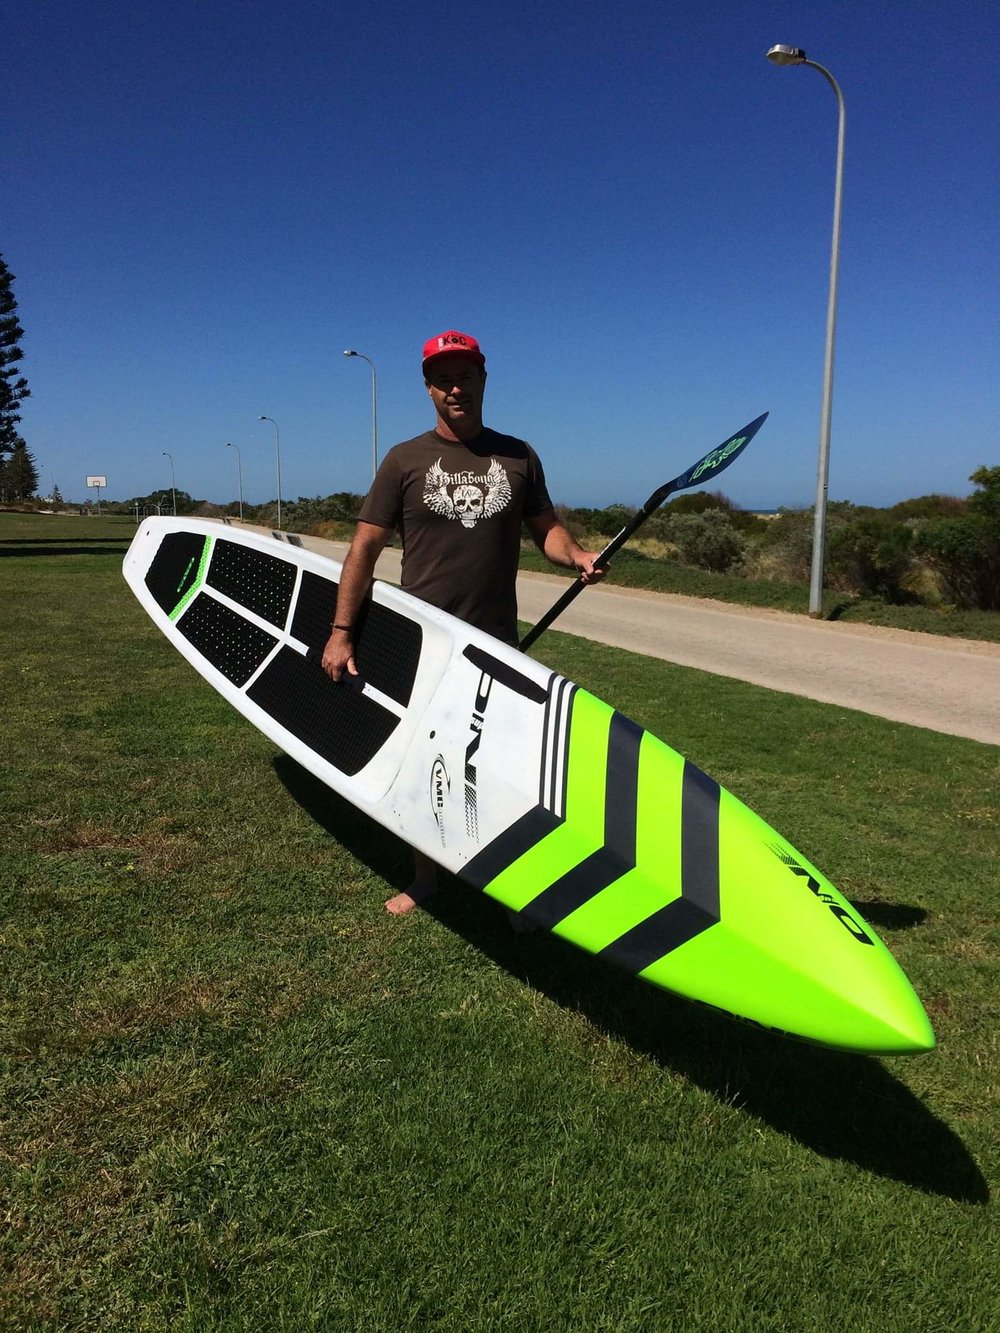 Scott McCluskey - Racer - Foiler - Surf